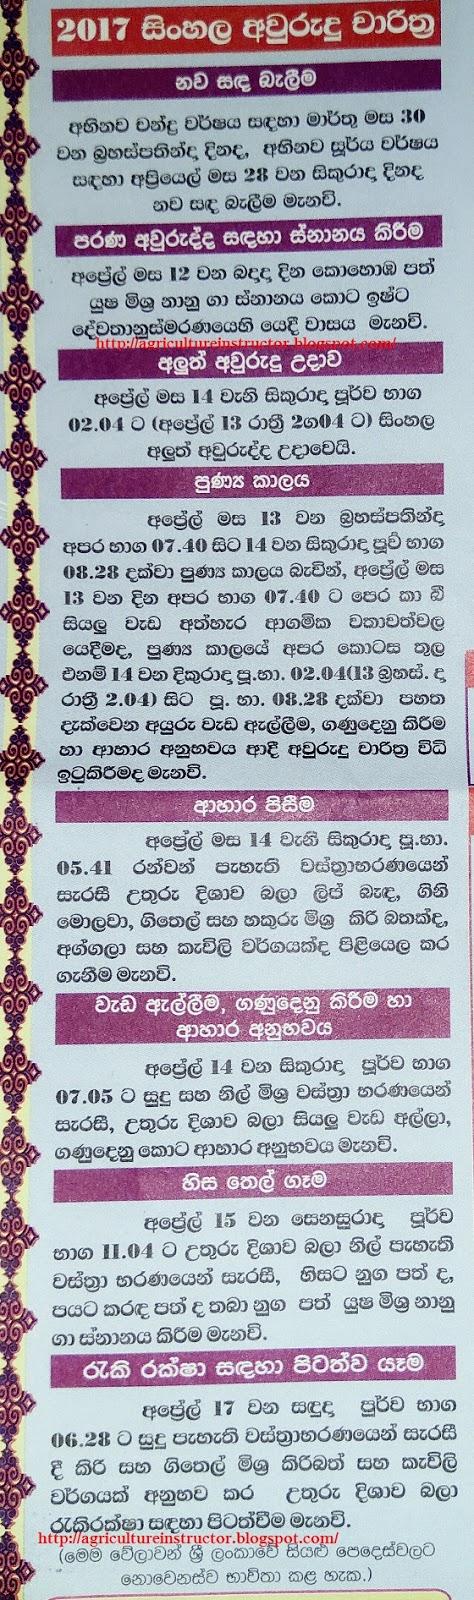 ... 2016 and its main festival of sri lankans avurudu nakath 2016 new year